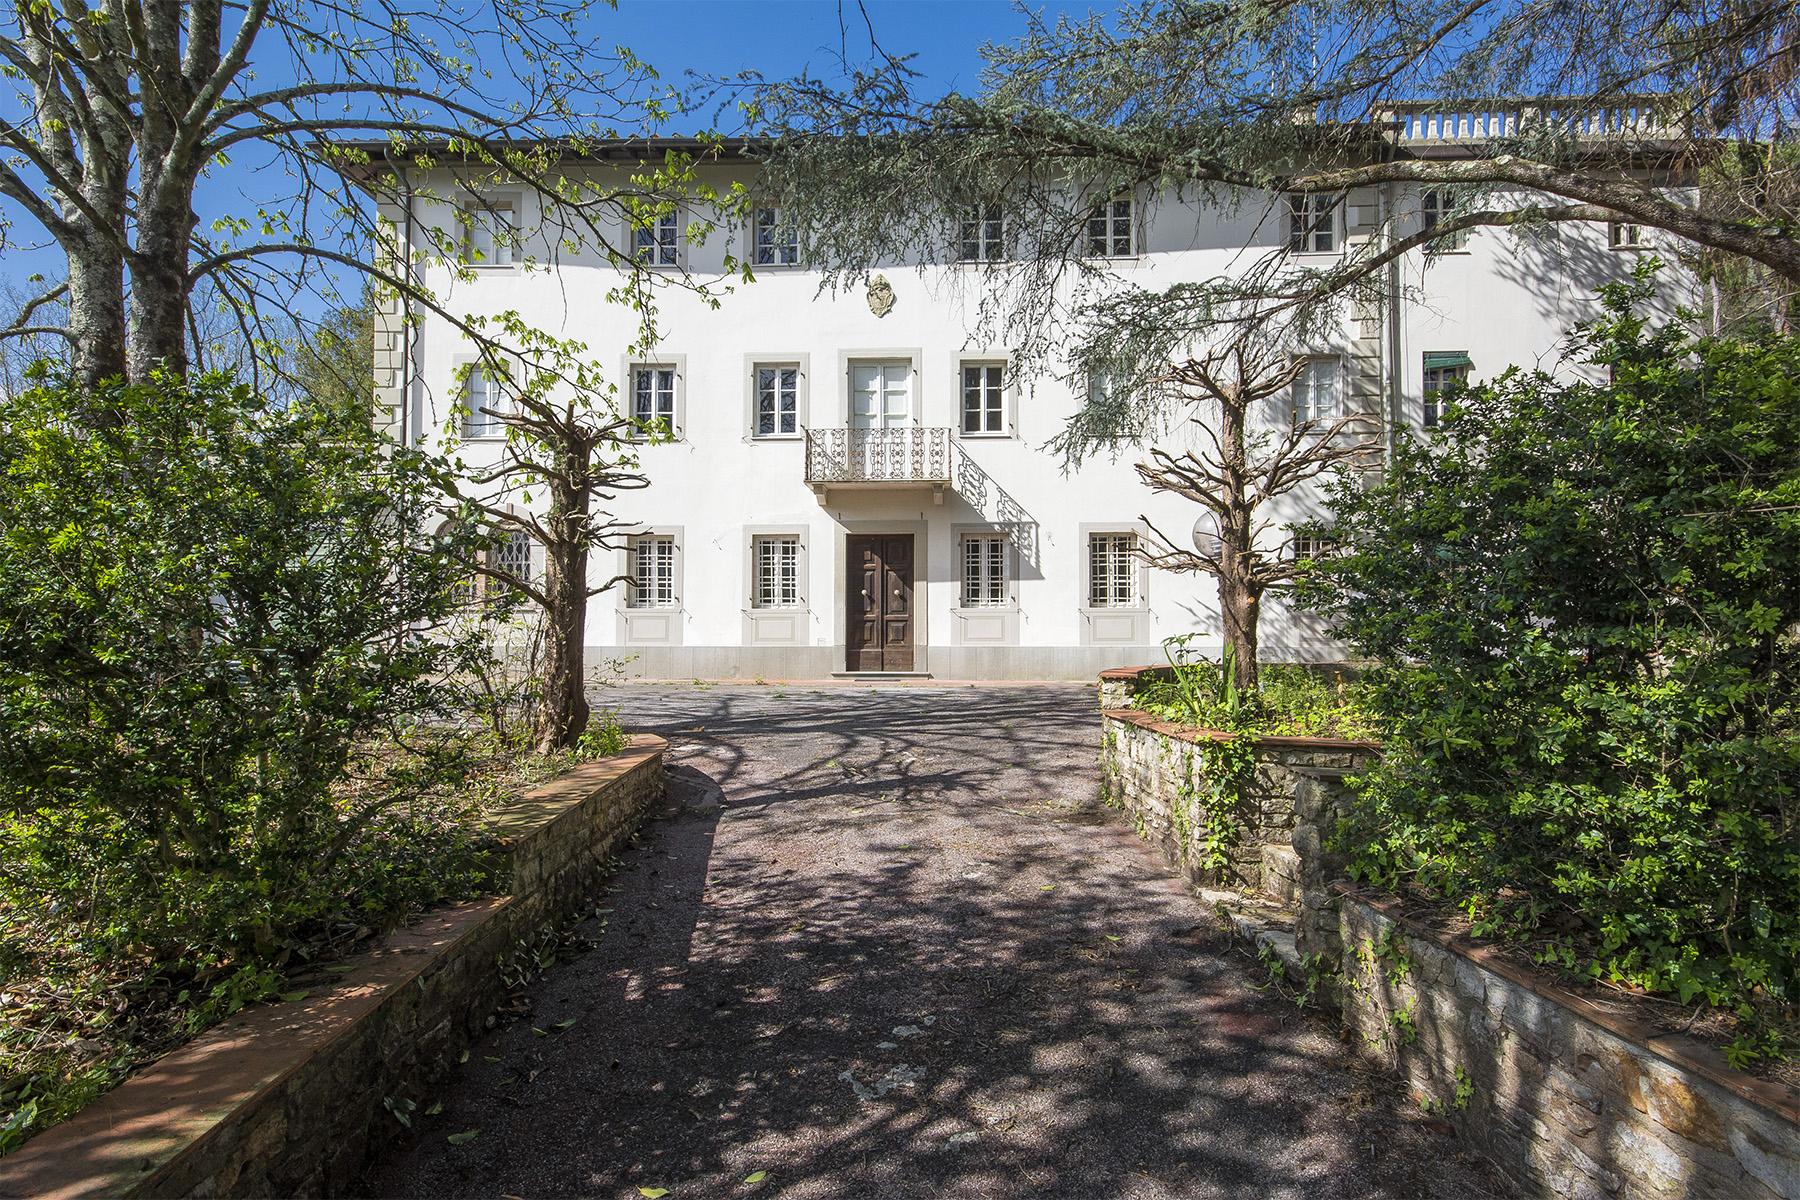 Villa in Vendita a Lucca: 5 locali, 700 mq - Foto 2